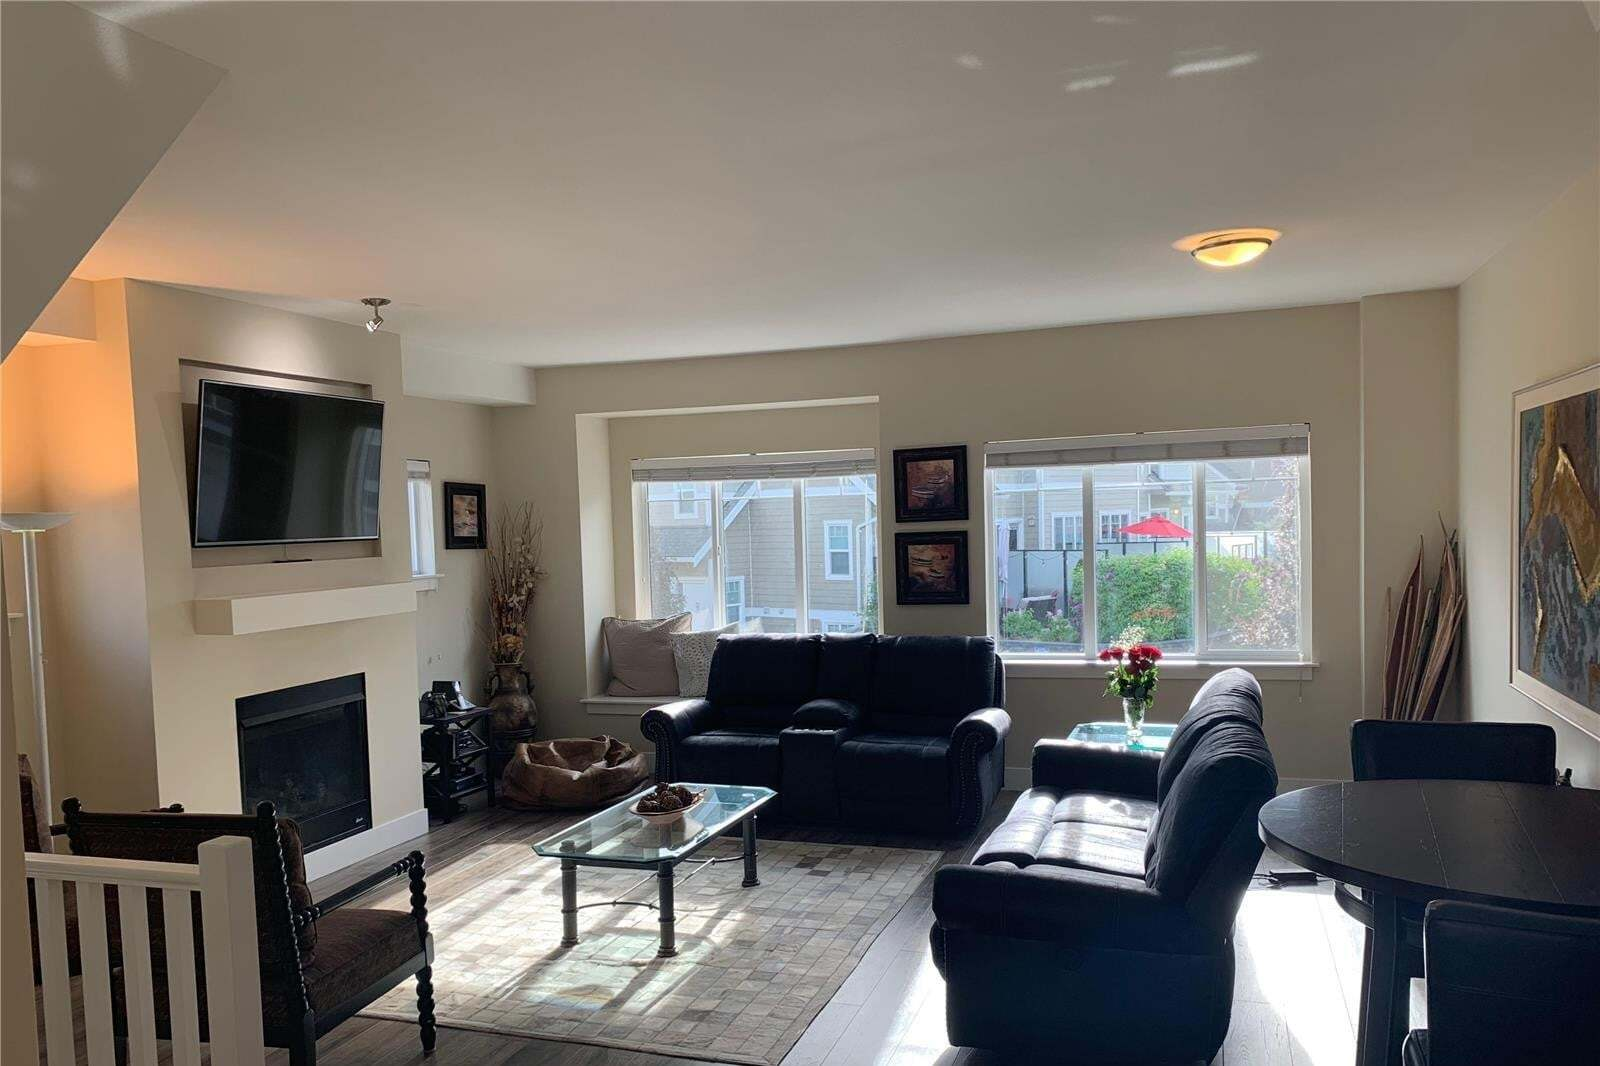 Townhouse for sale at 600 Sherwood Rd Kelowna British Columbia - MLS: 10205191